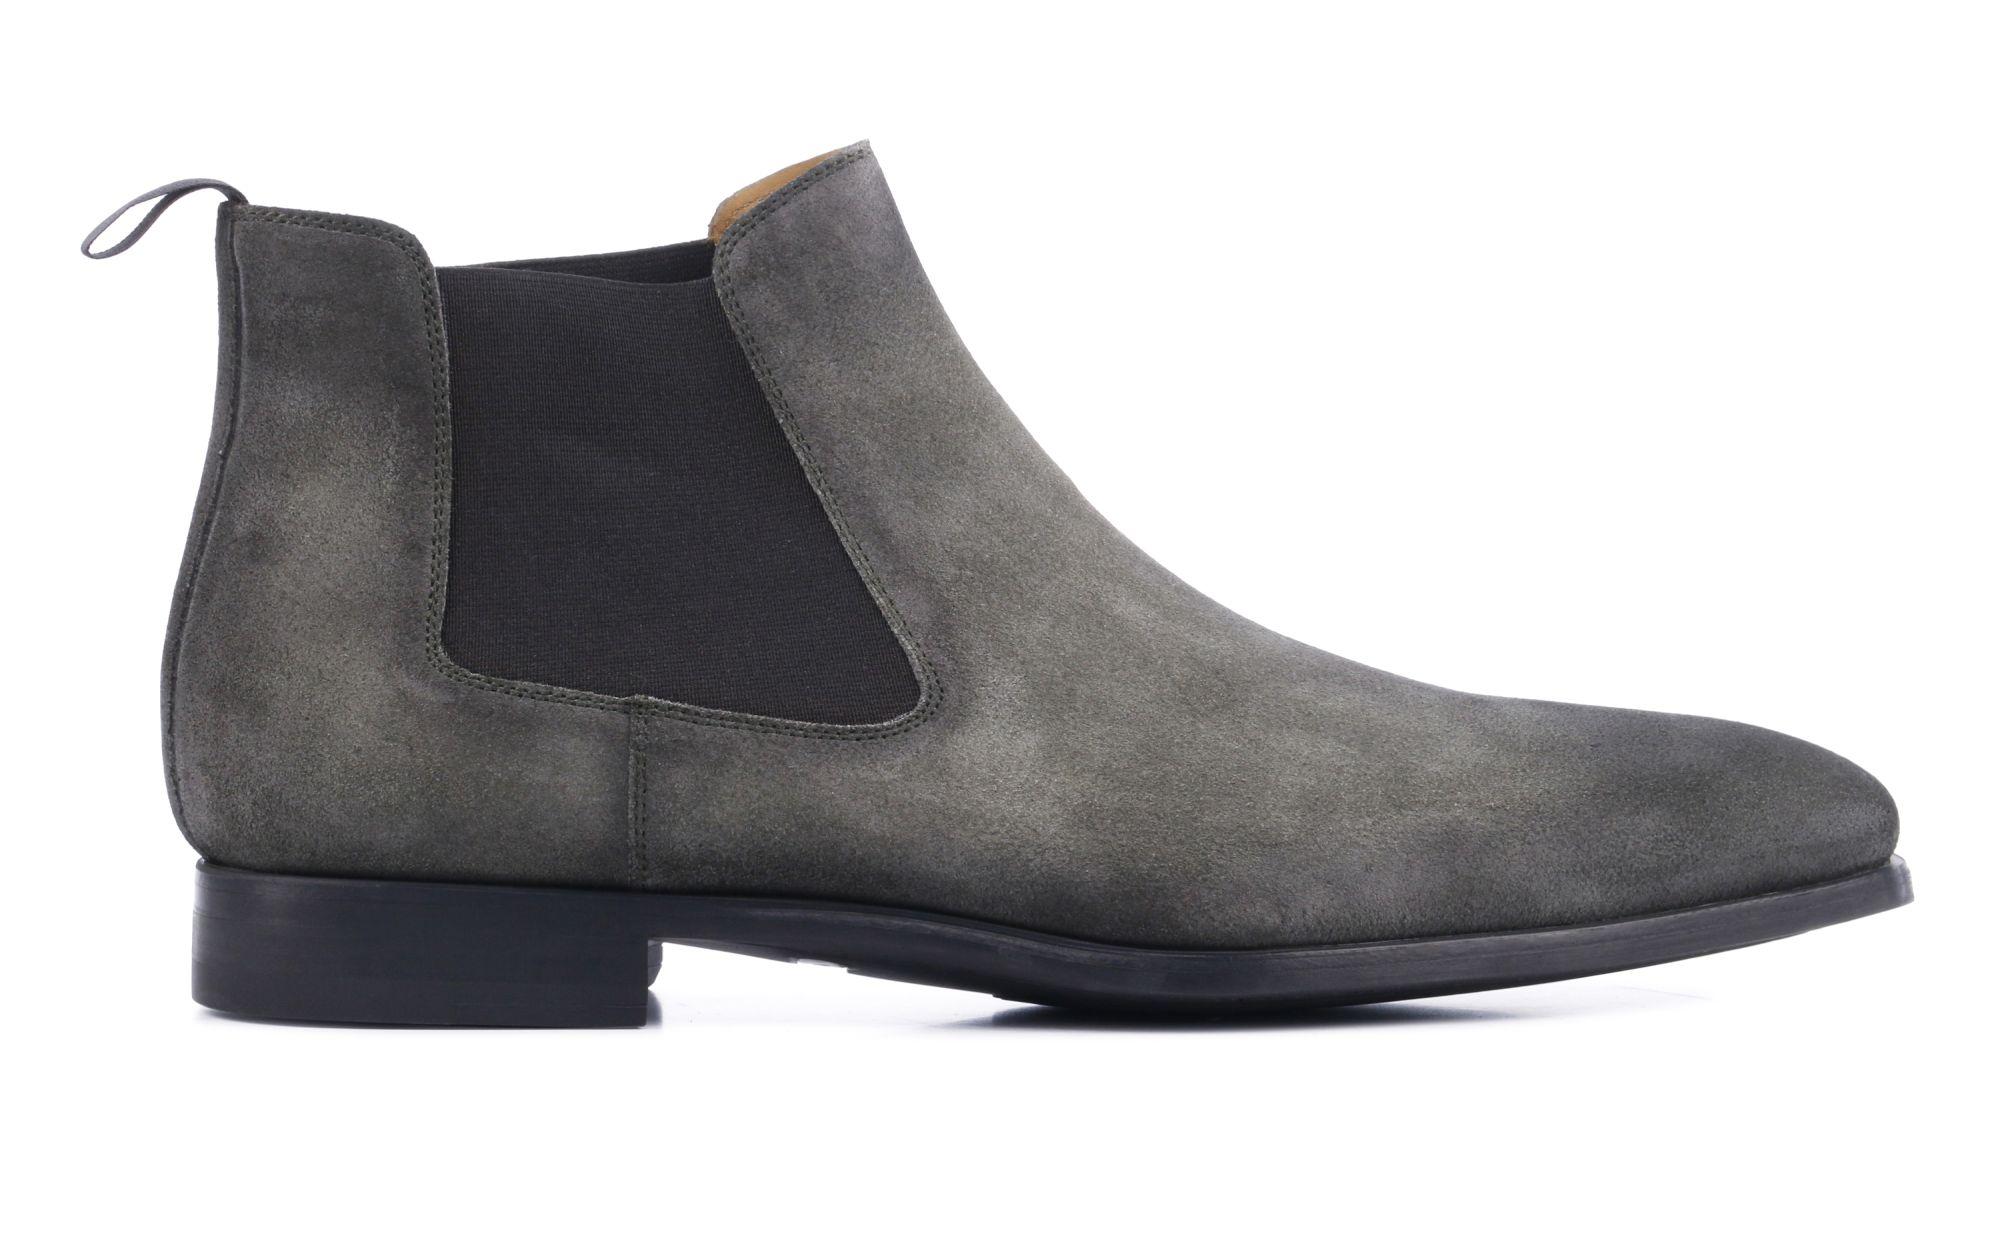 Magnanni Heren Leren Boots